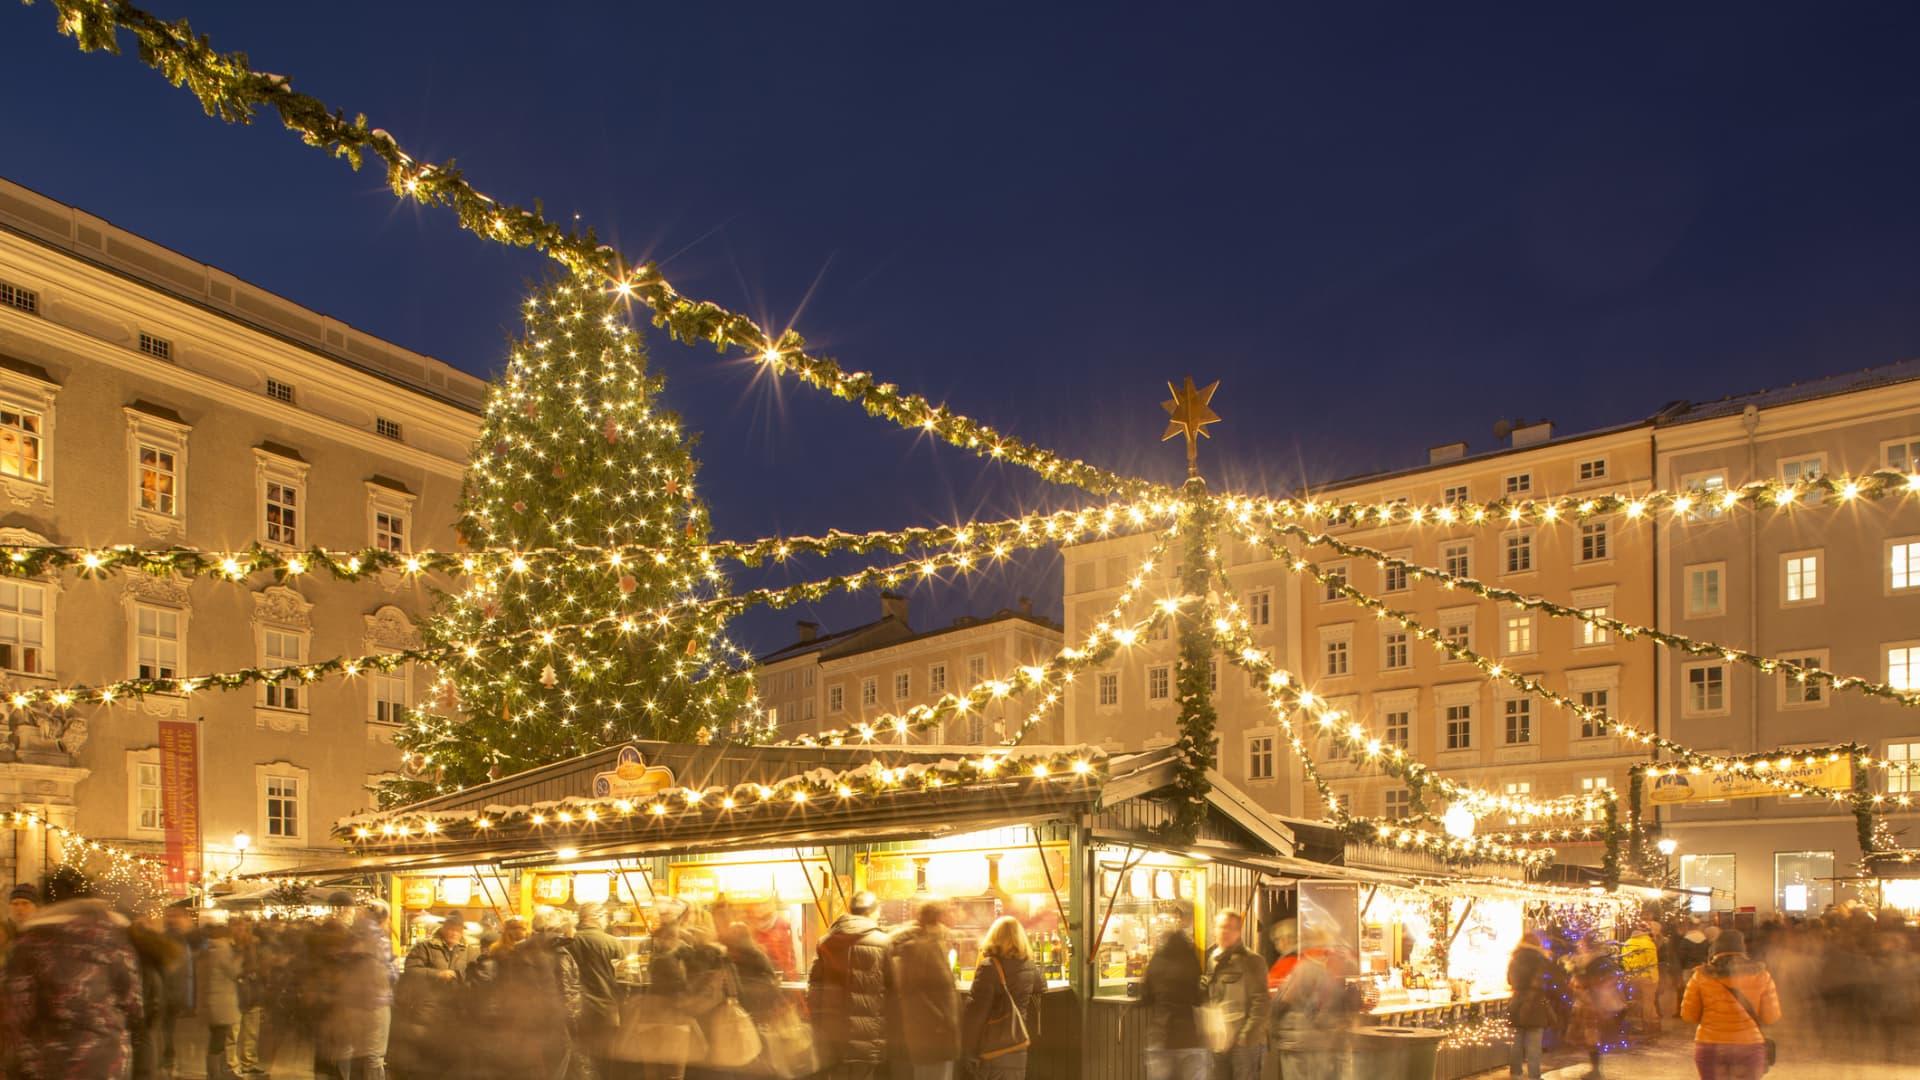 A Christmas market in Salzburg, Austria.